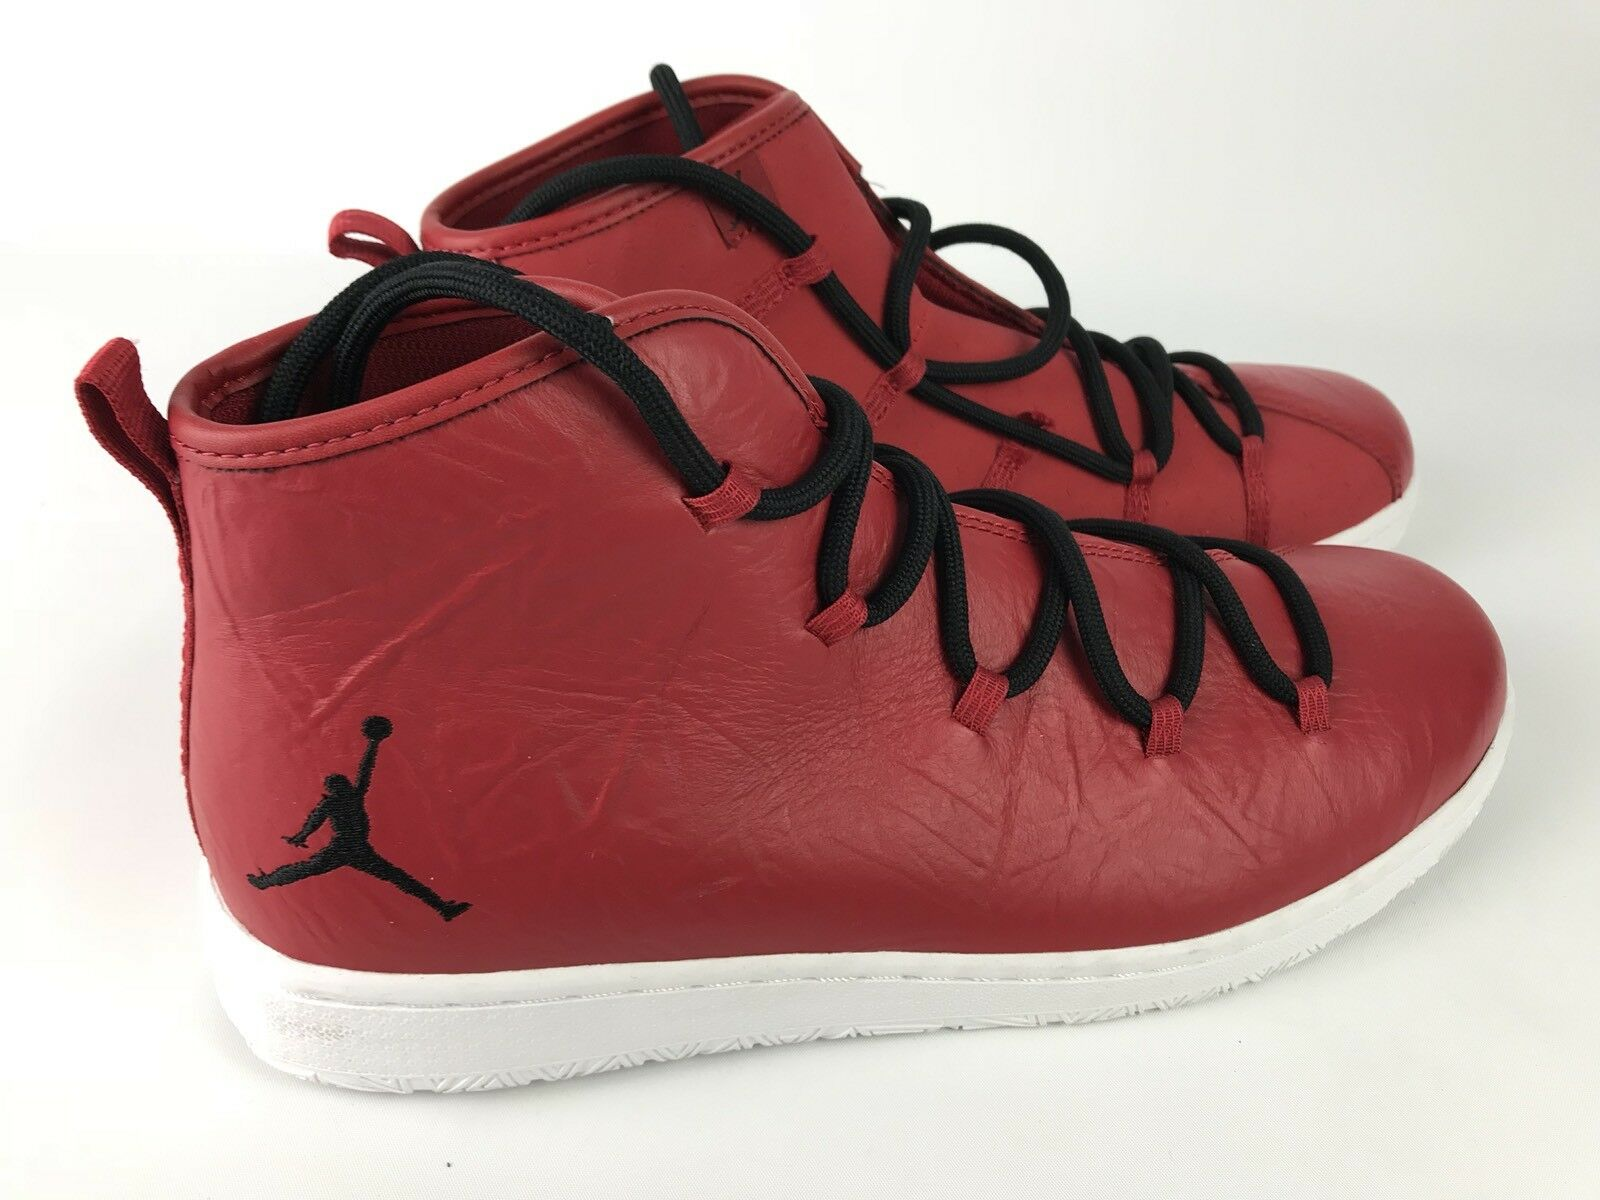 Nike air jordan jordan rossa galassia palestra di pelle rossa jordan numero 11 820255-60 scarpe da basket e9ce0c